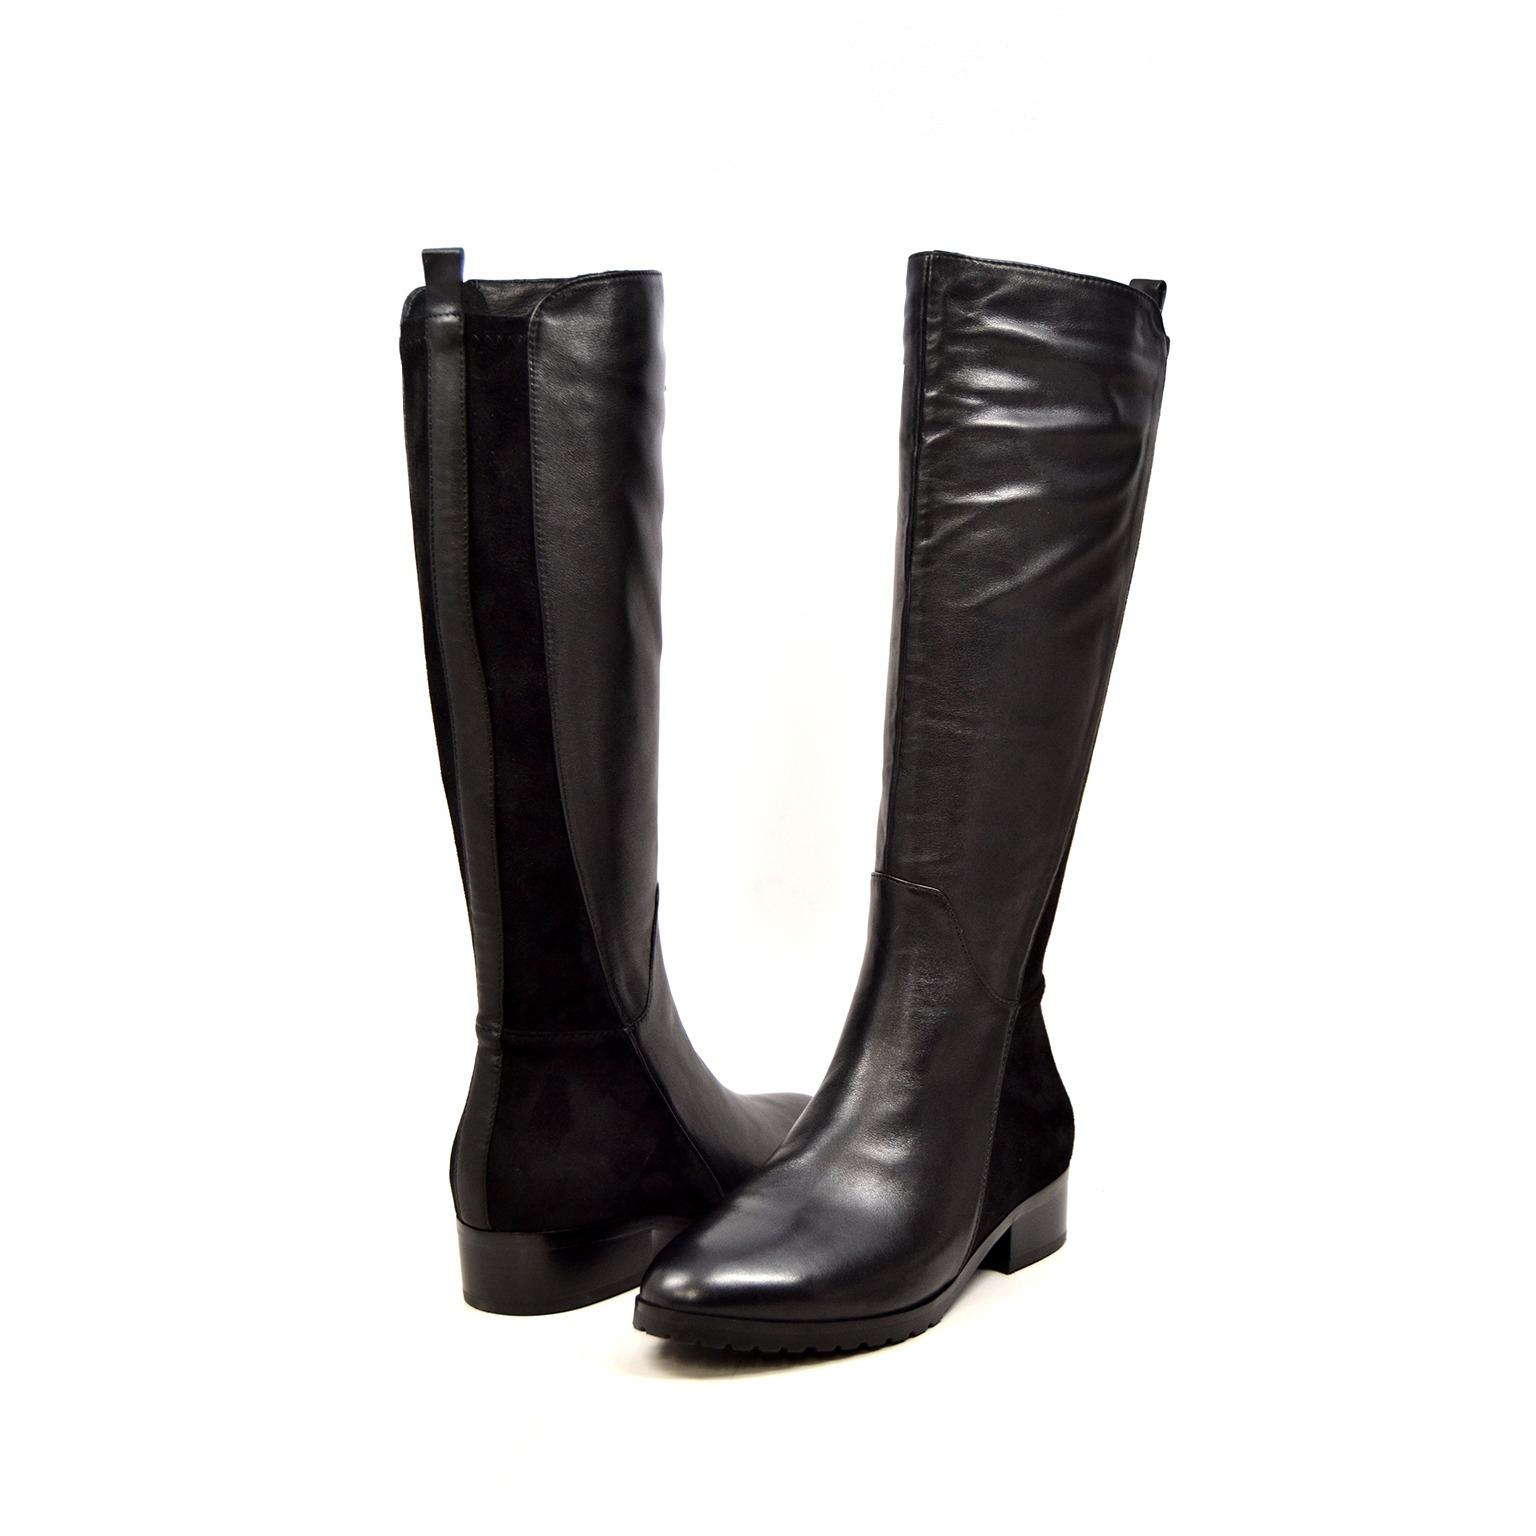 SoleMani Women's Trendy Black Leather